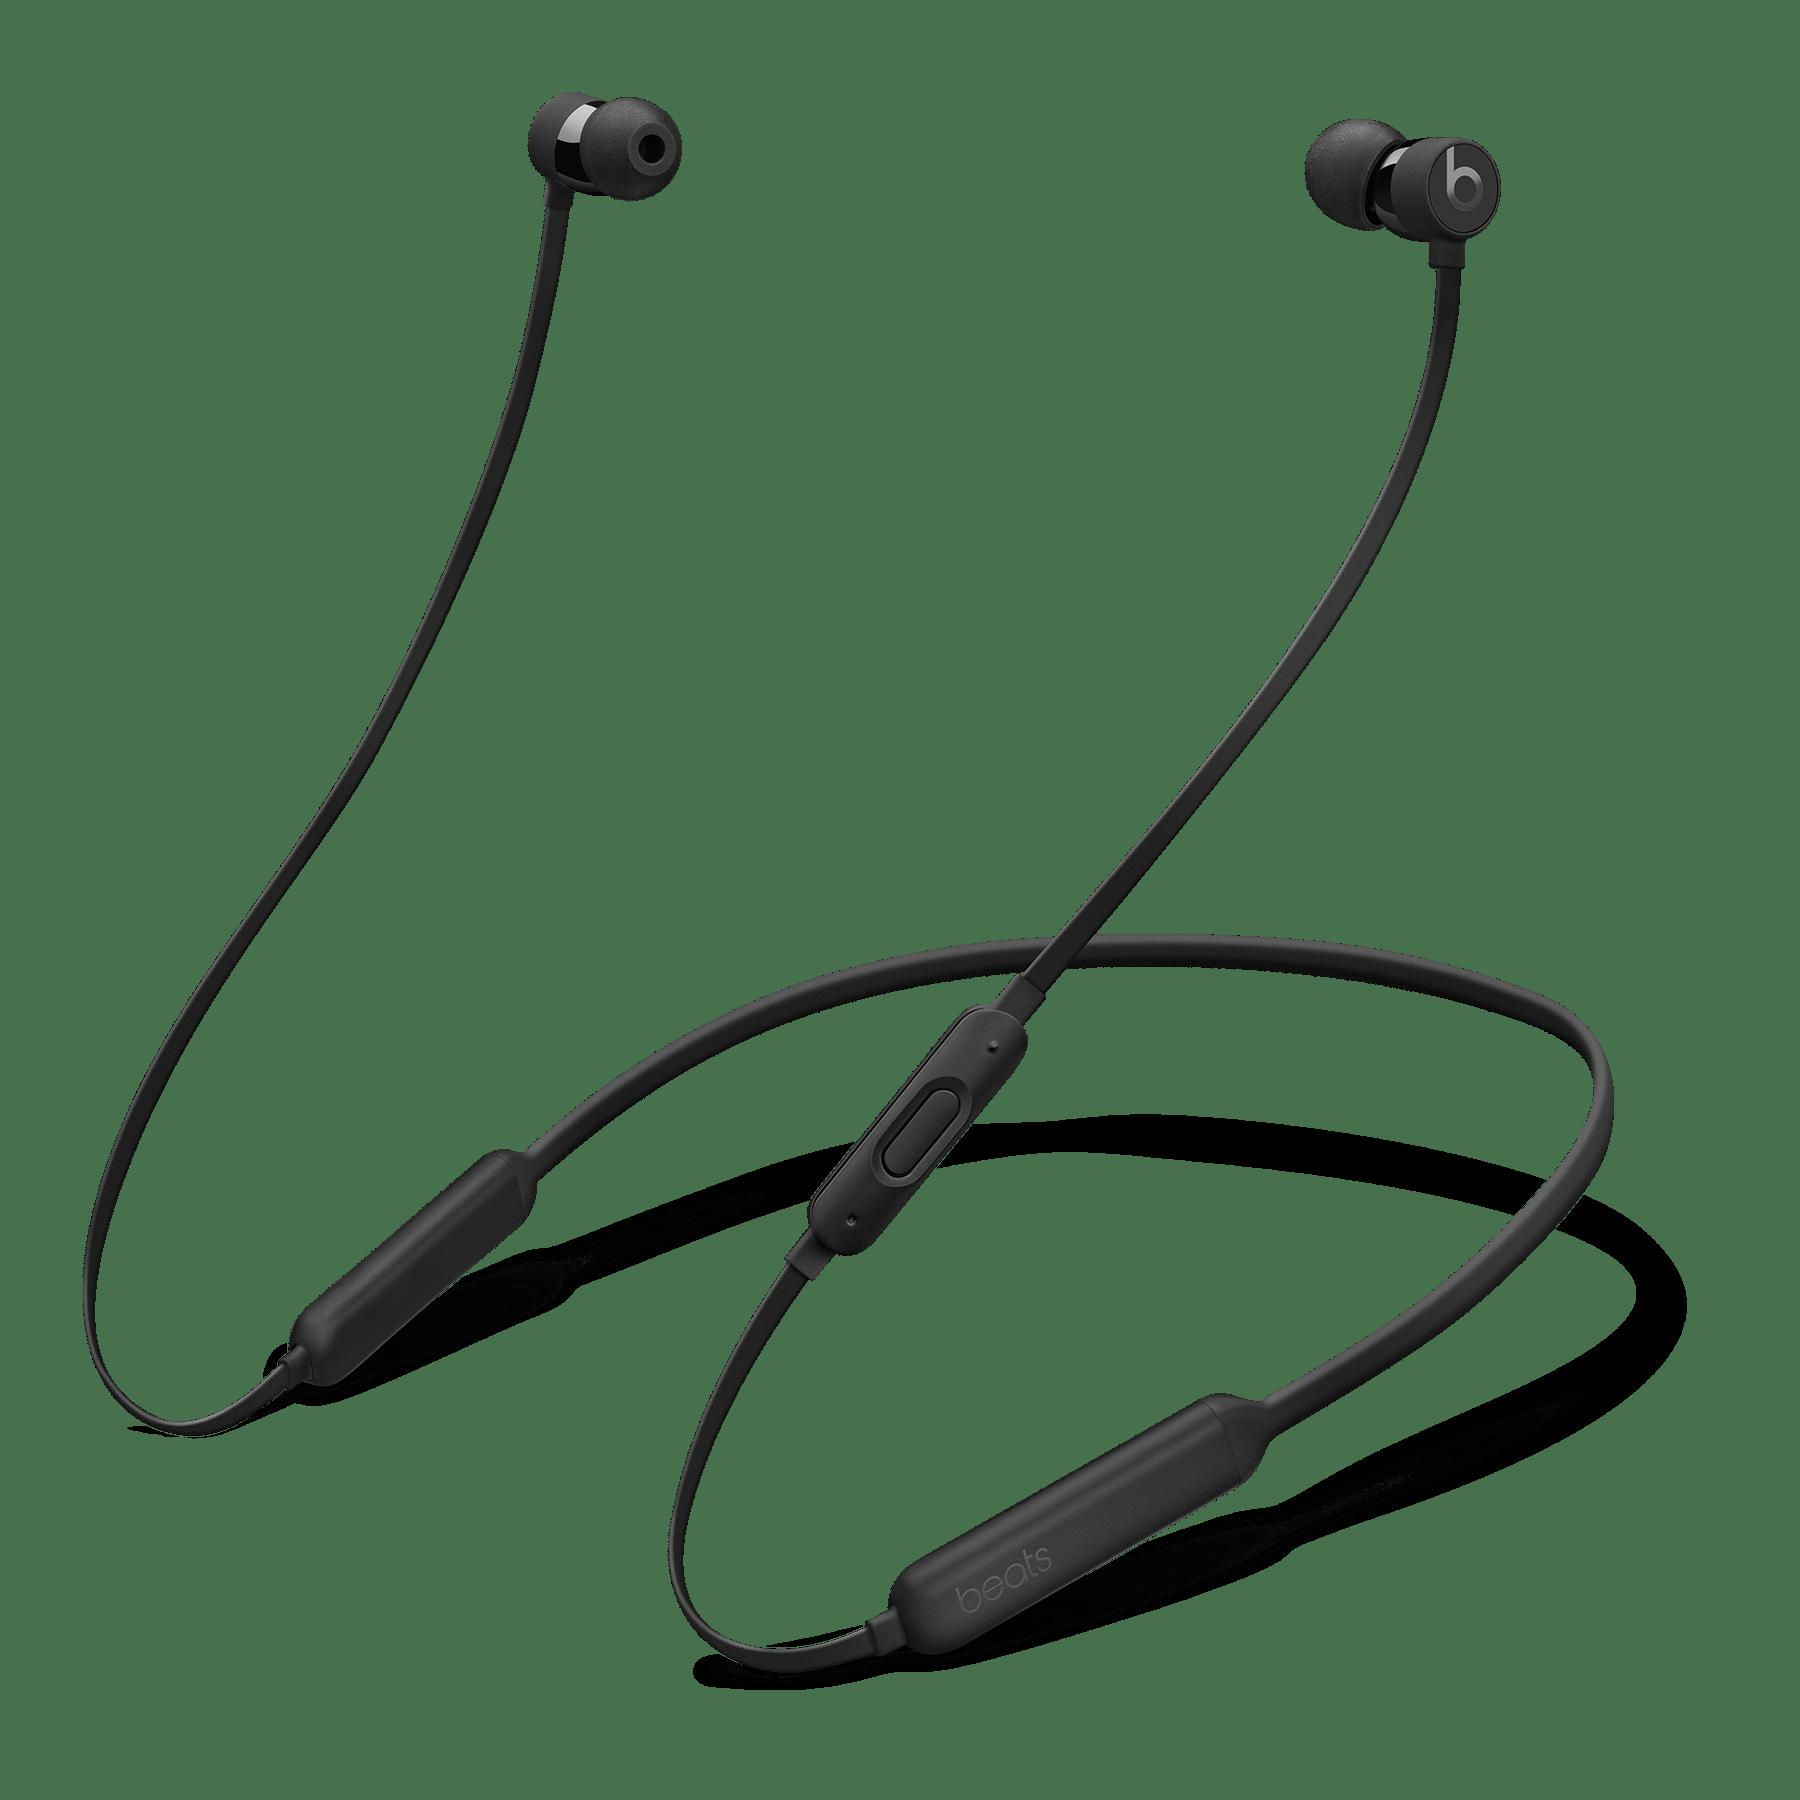 banner transparent Beatsx beats by dre. Earbuds clipart headphone apple